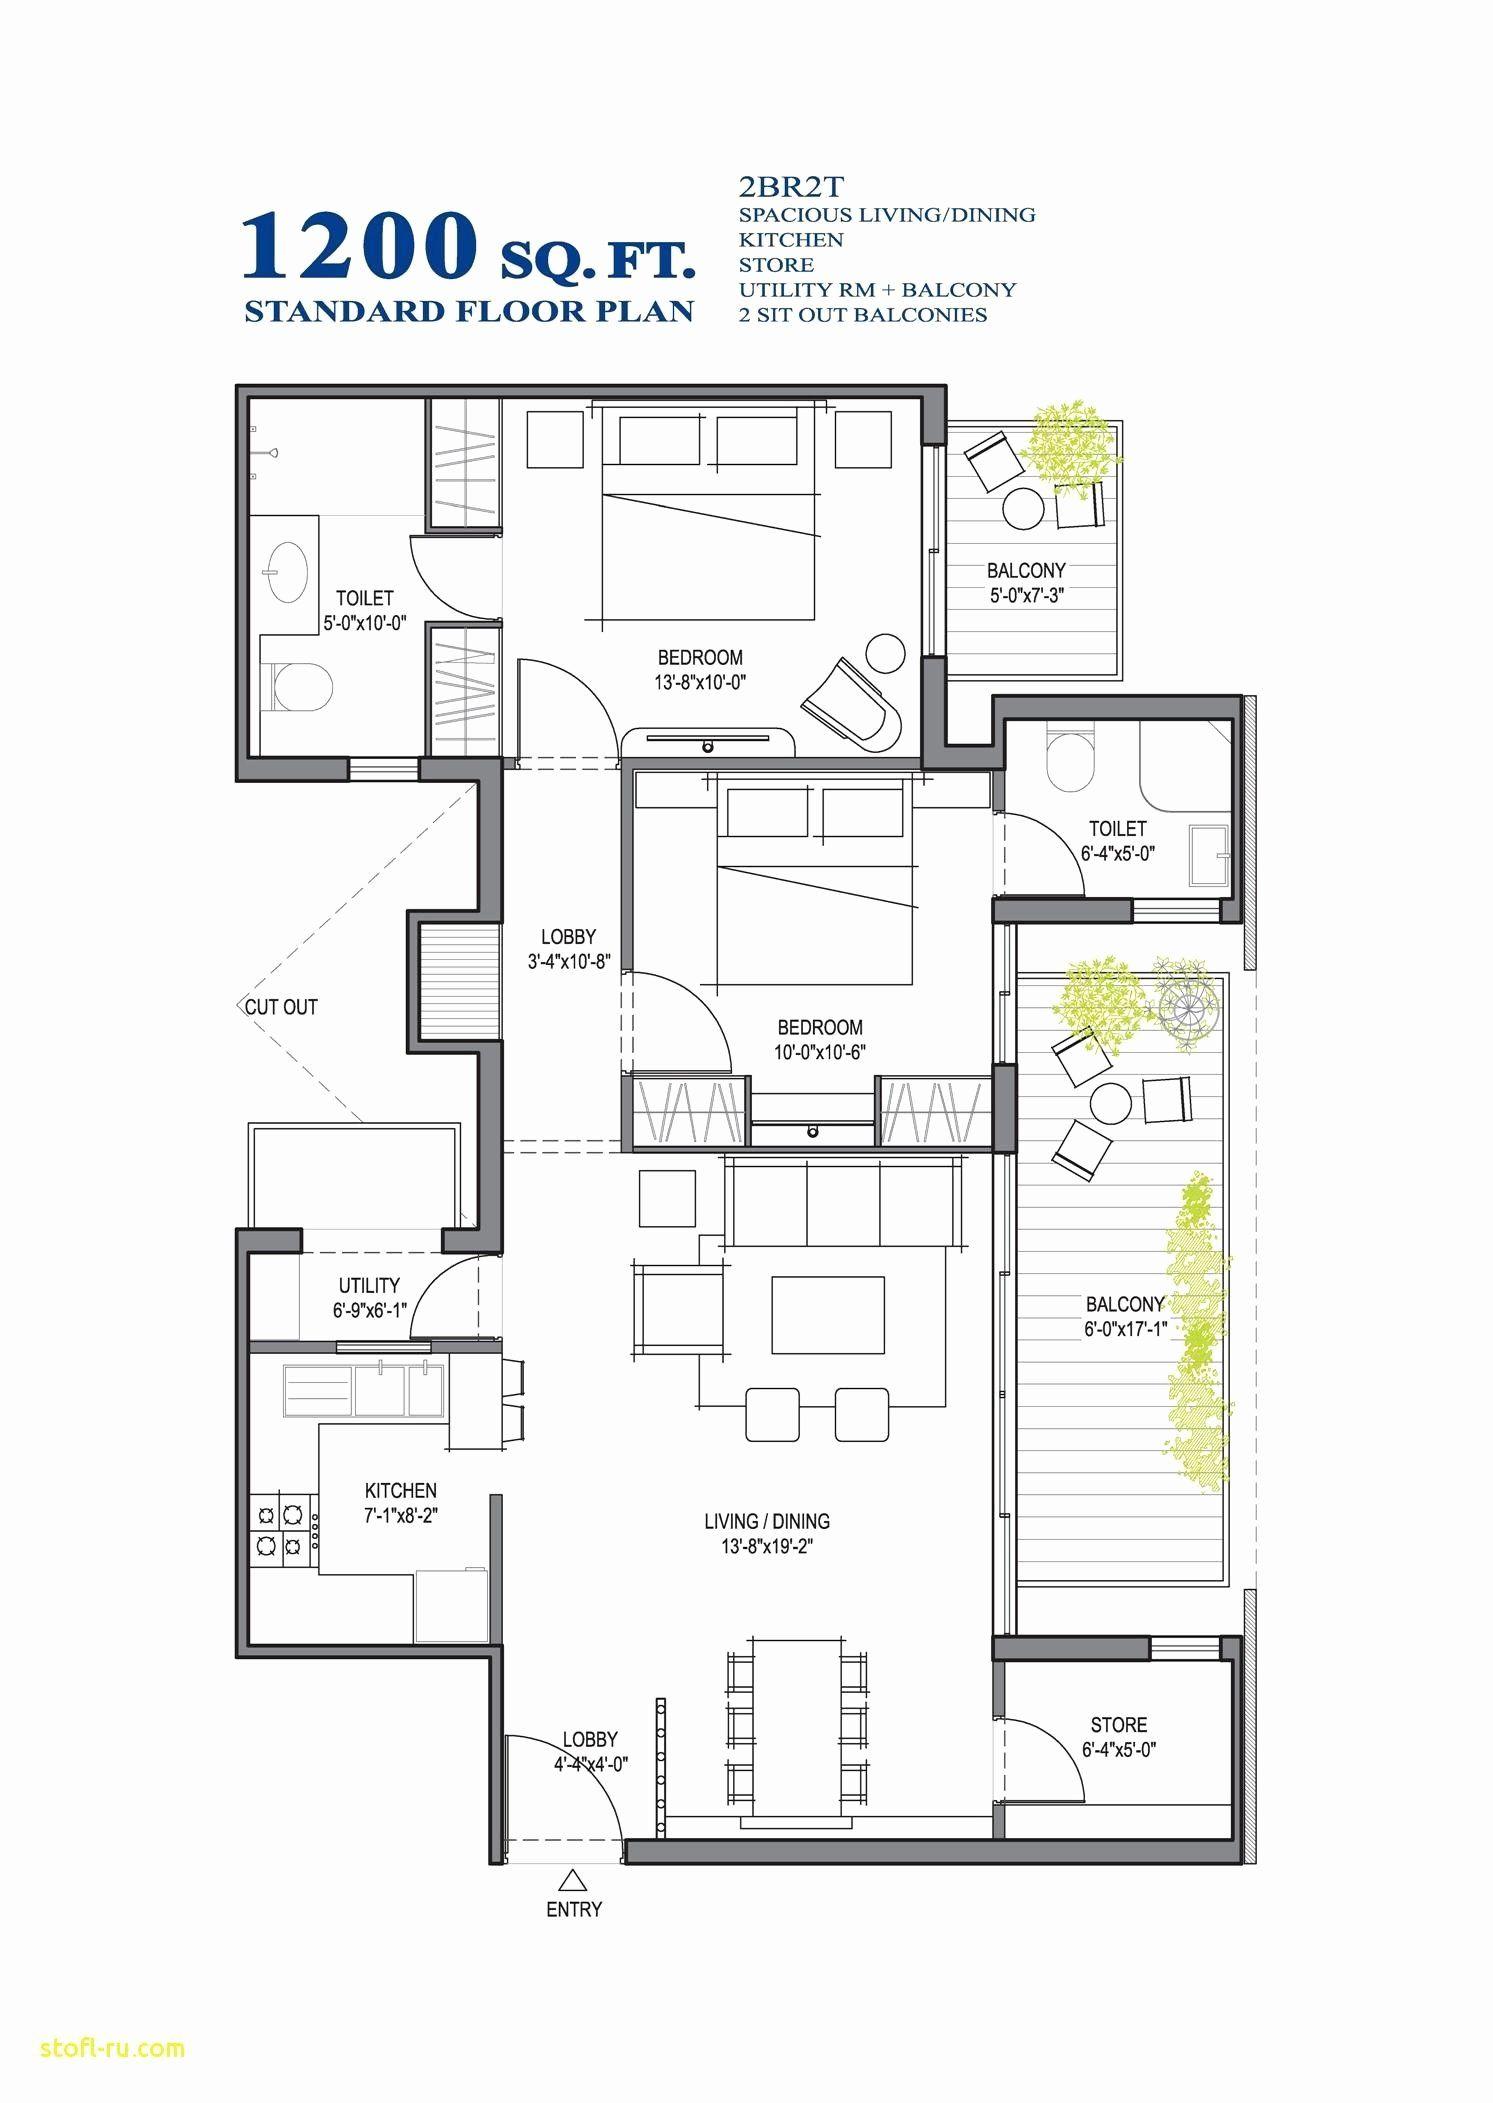 1500 Sq Ft House Plans Elegant Modern Small House Plans Under 1500 Sq Ft Smallhouseplans In 2020 Indian House Plans Bungalow House Plans Basement House Plans